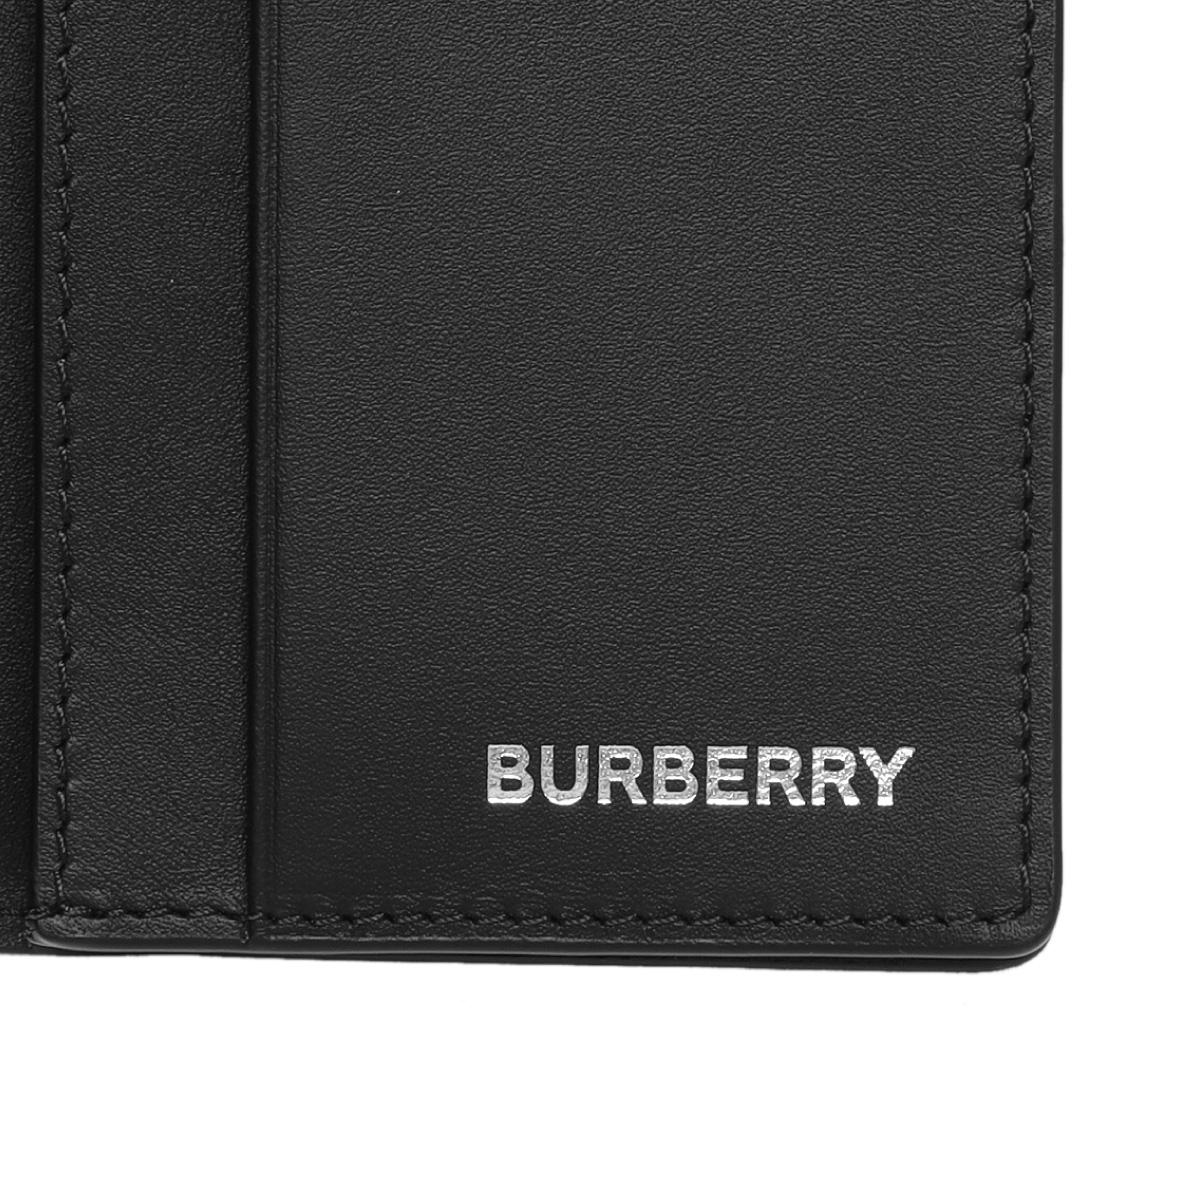 BURBERRY バーバリー | カードケース